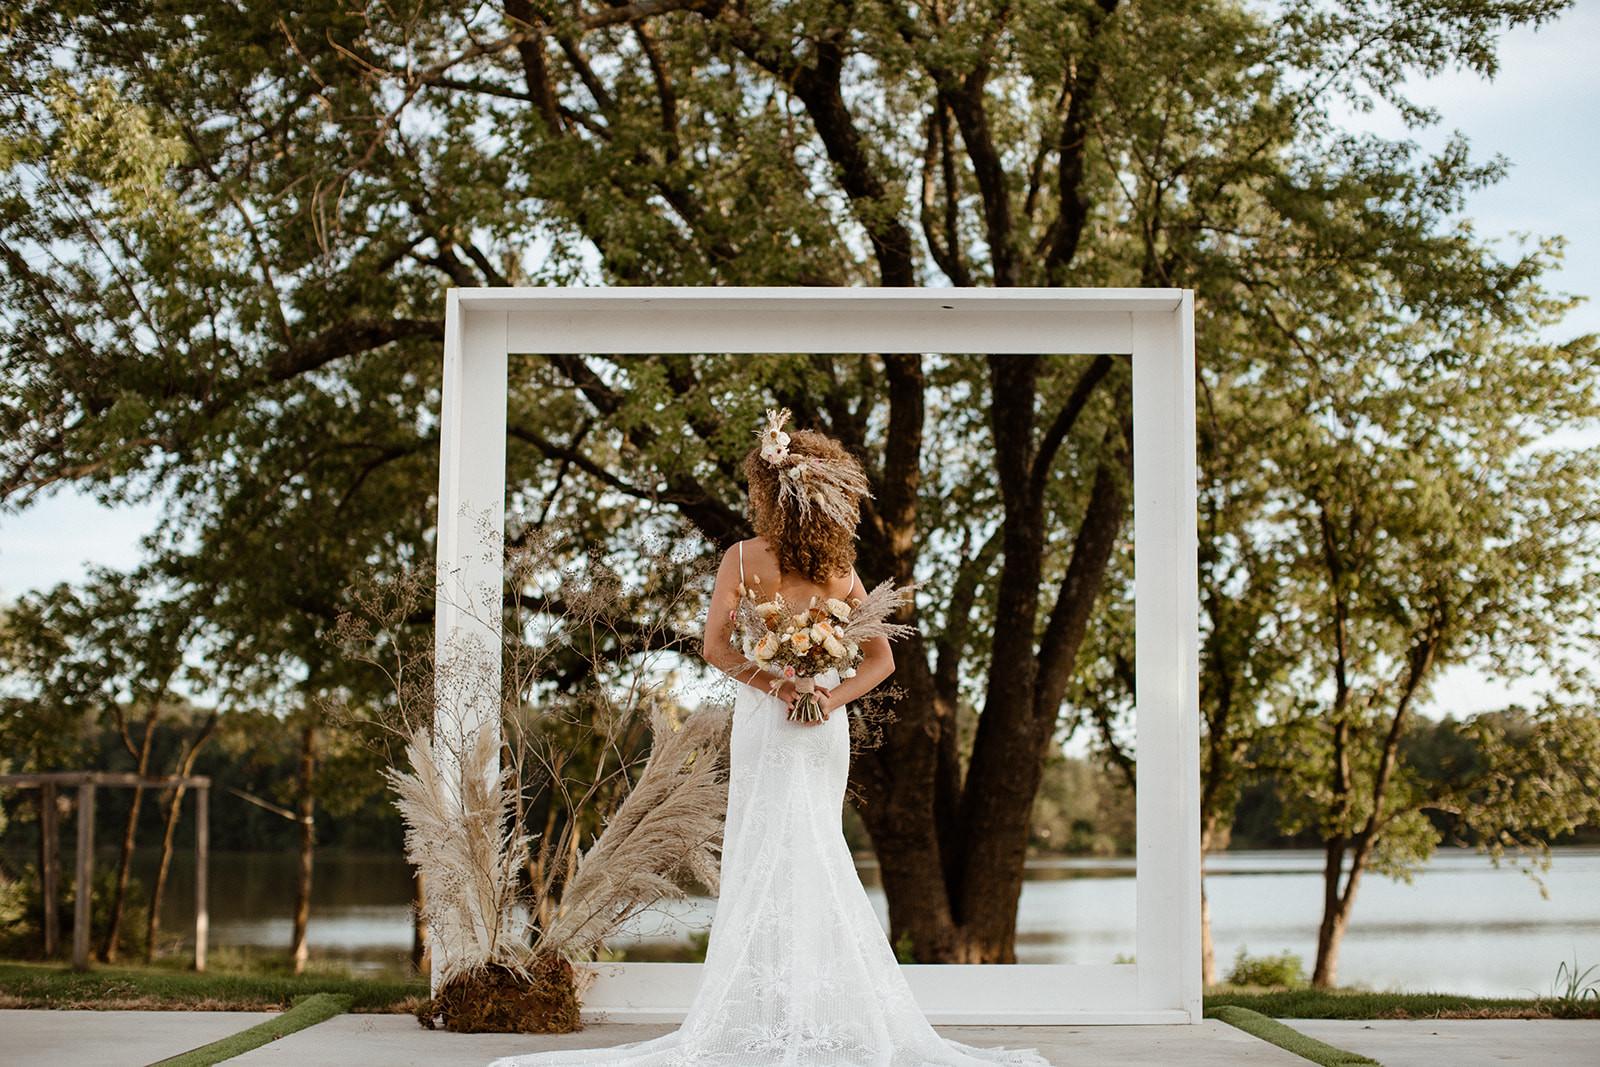 laura powers photo%2c arkansas wedding a